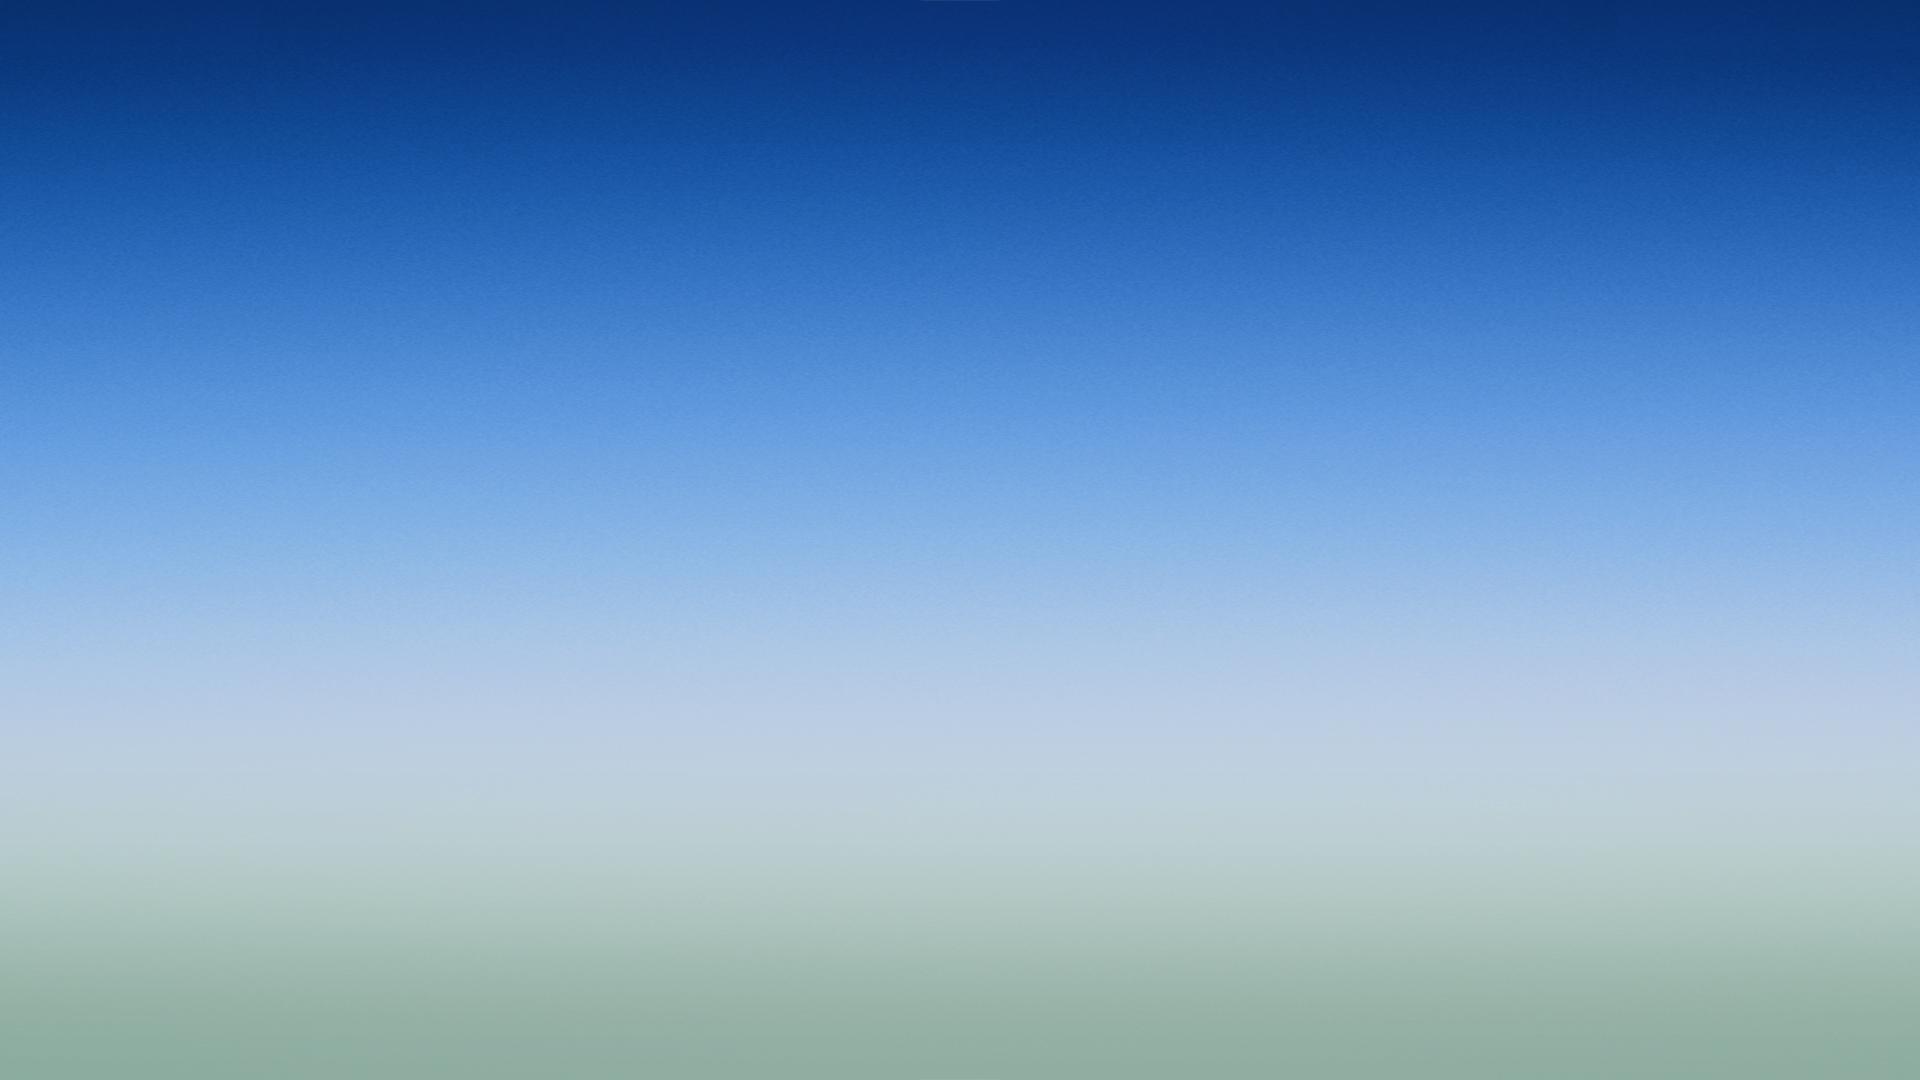 Official Wallpaper Apple Ipad Air 2 Imac Retina 5k Display HD Walls 1920x1080